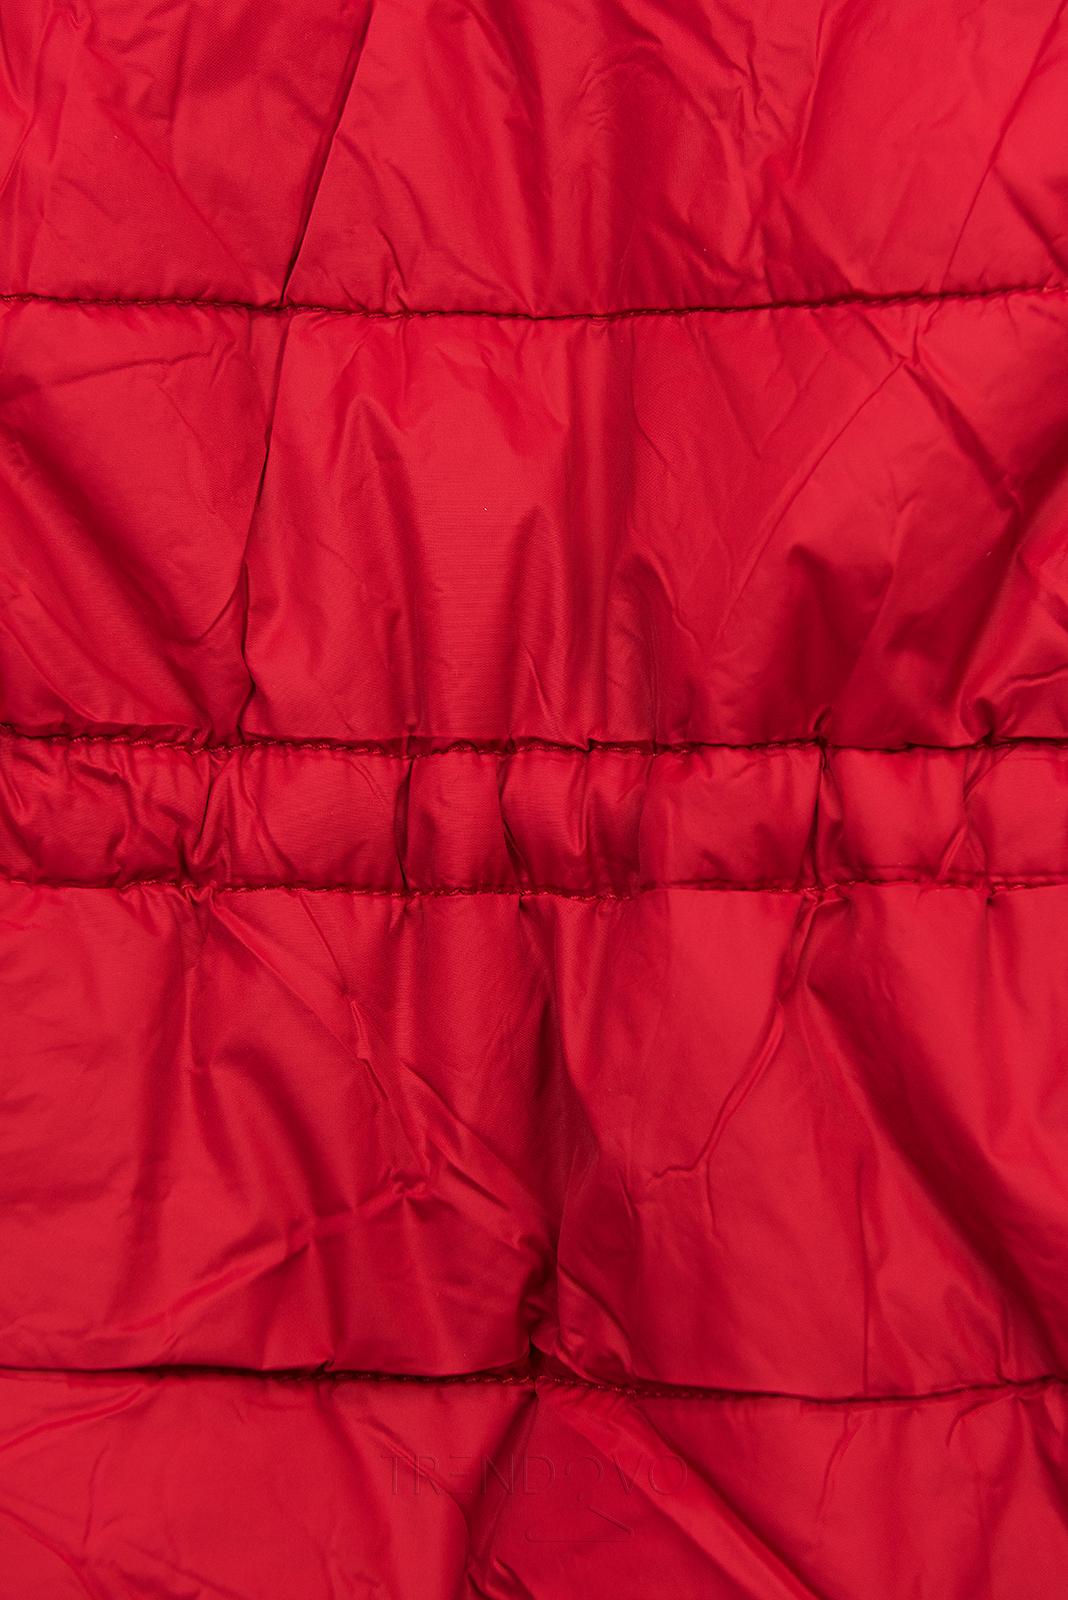 Červená/hnedá obojstranná bunda s výplňou